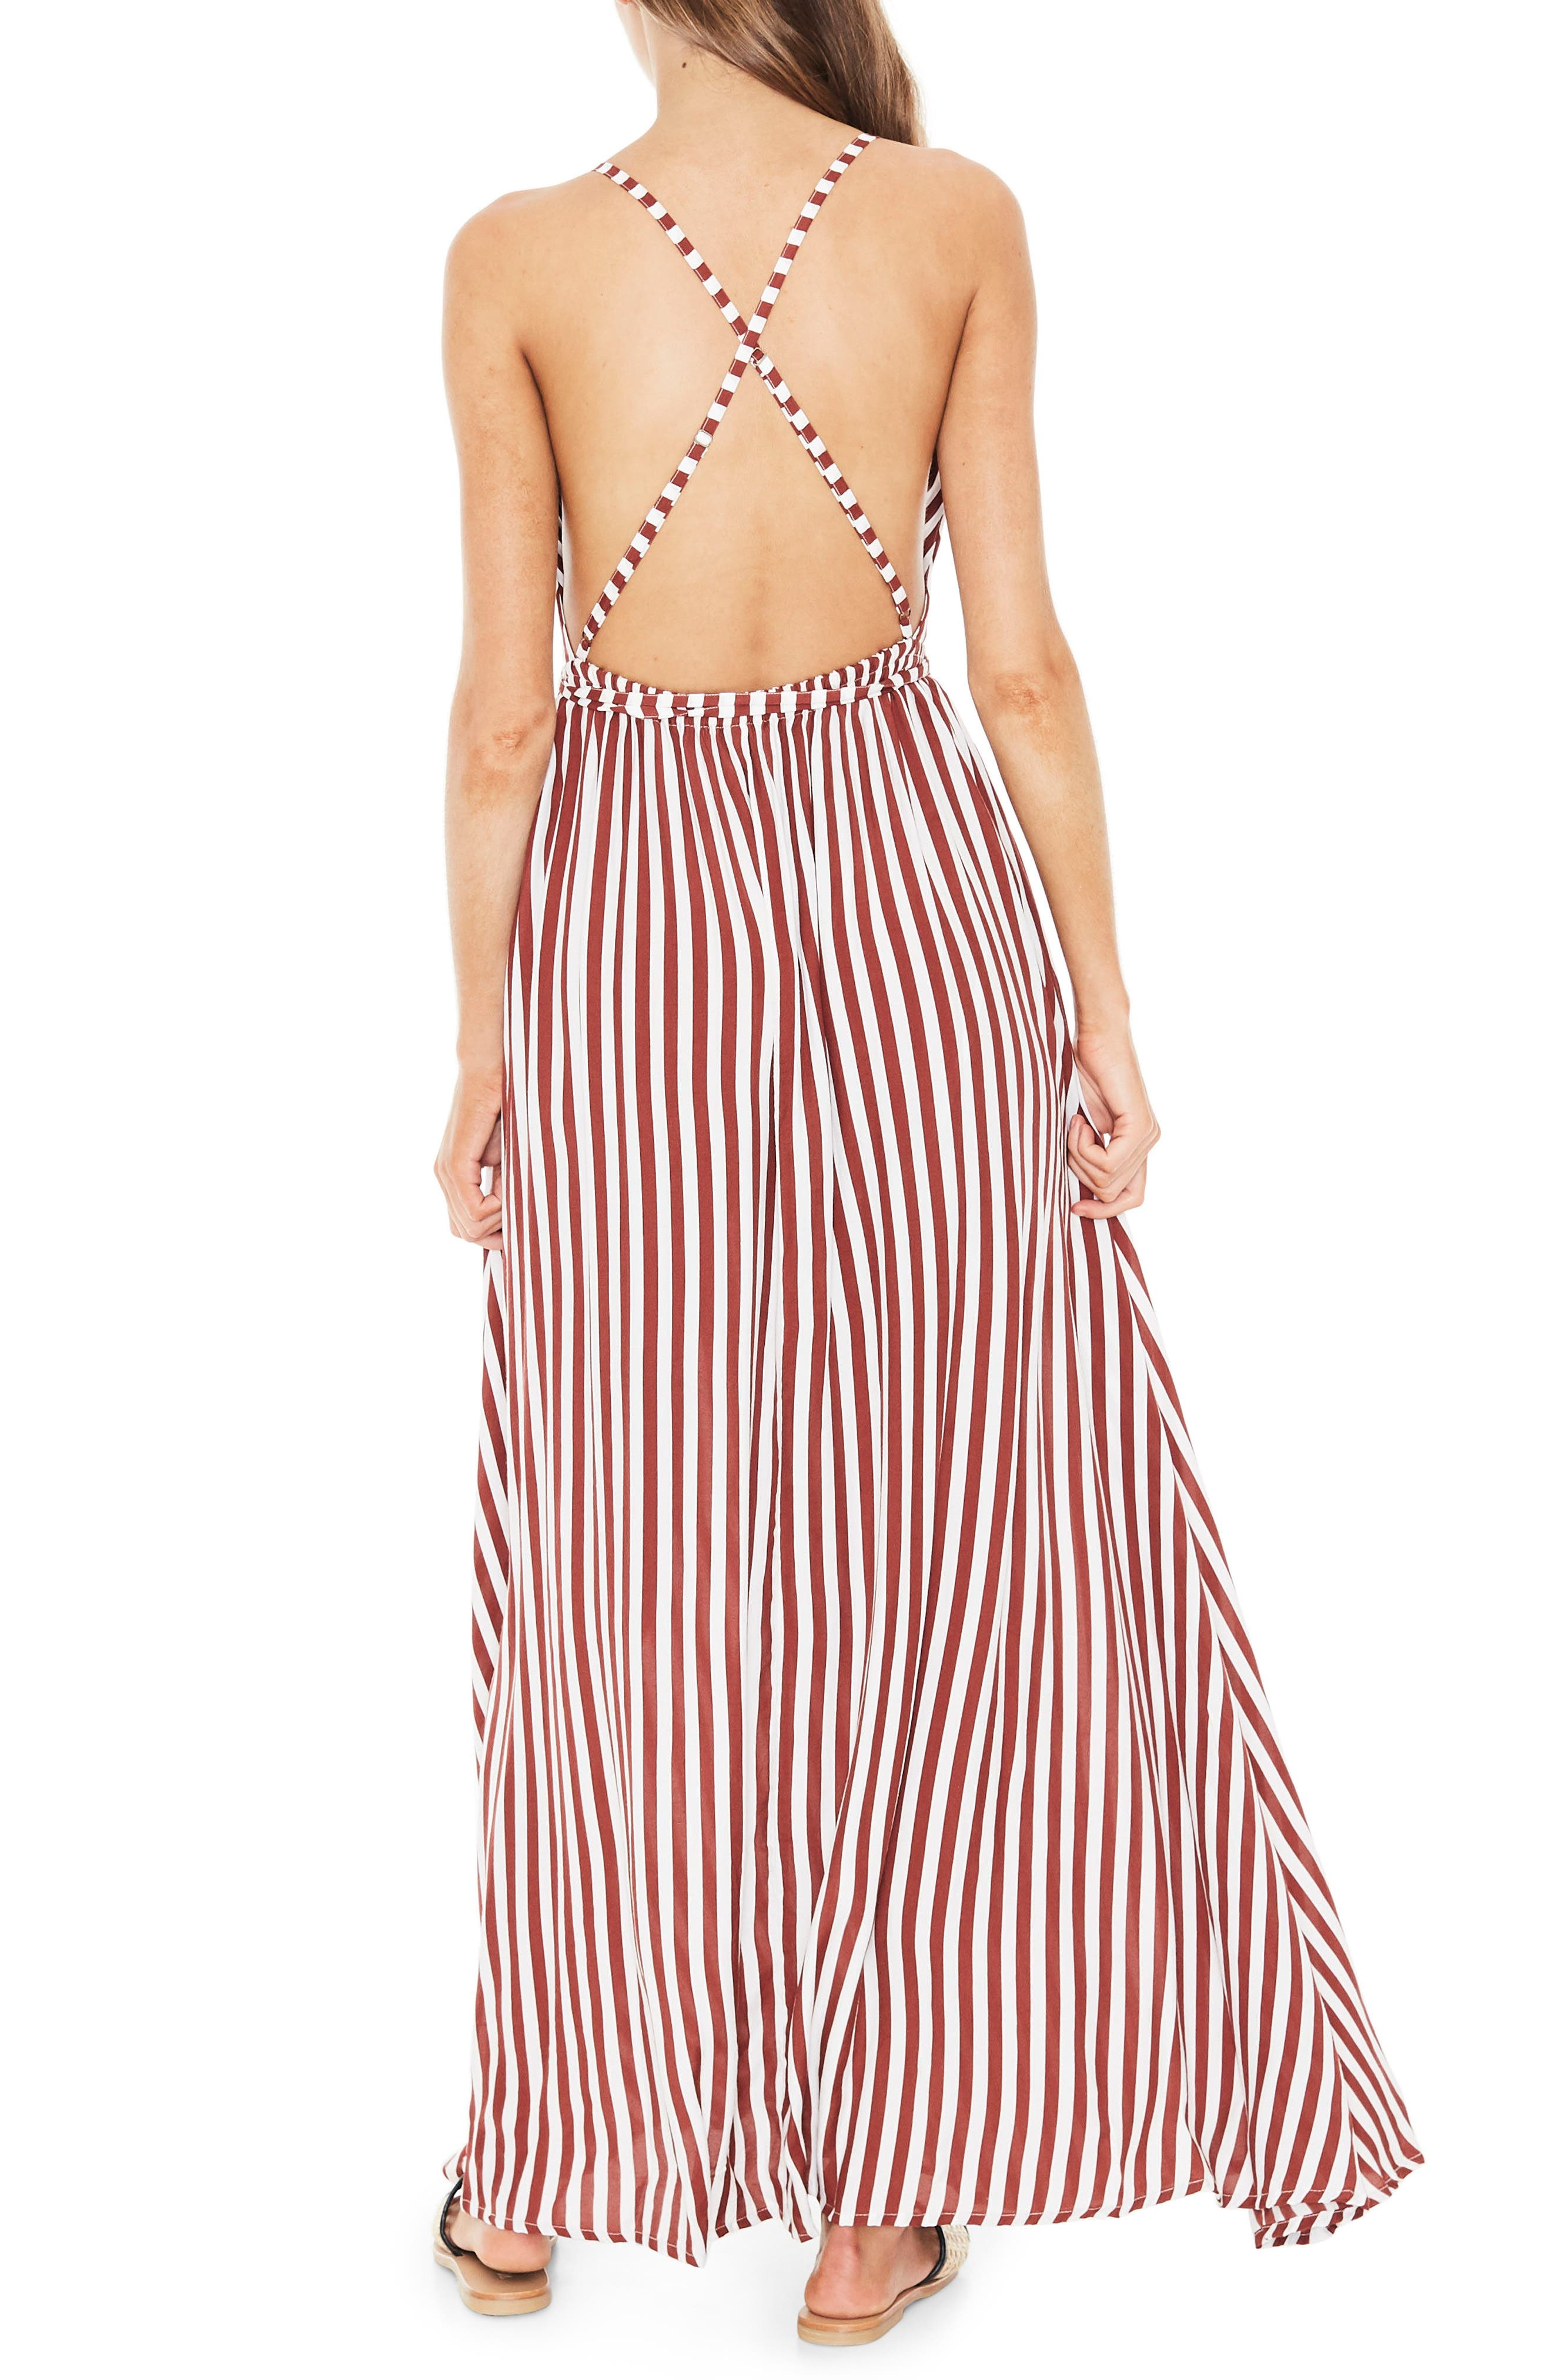 Santa Rosa Maxi Dress,                             Alternate thumbnail 2, color,                             Zeus Stripe Prints - Maroon